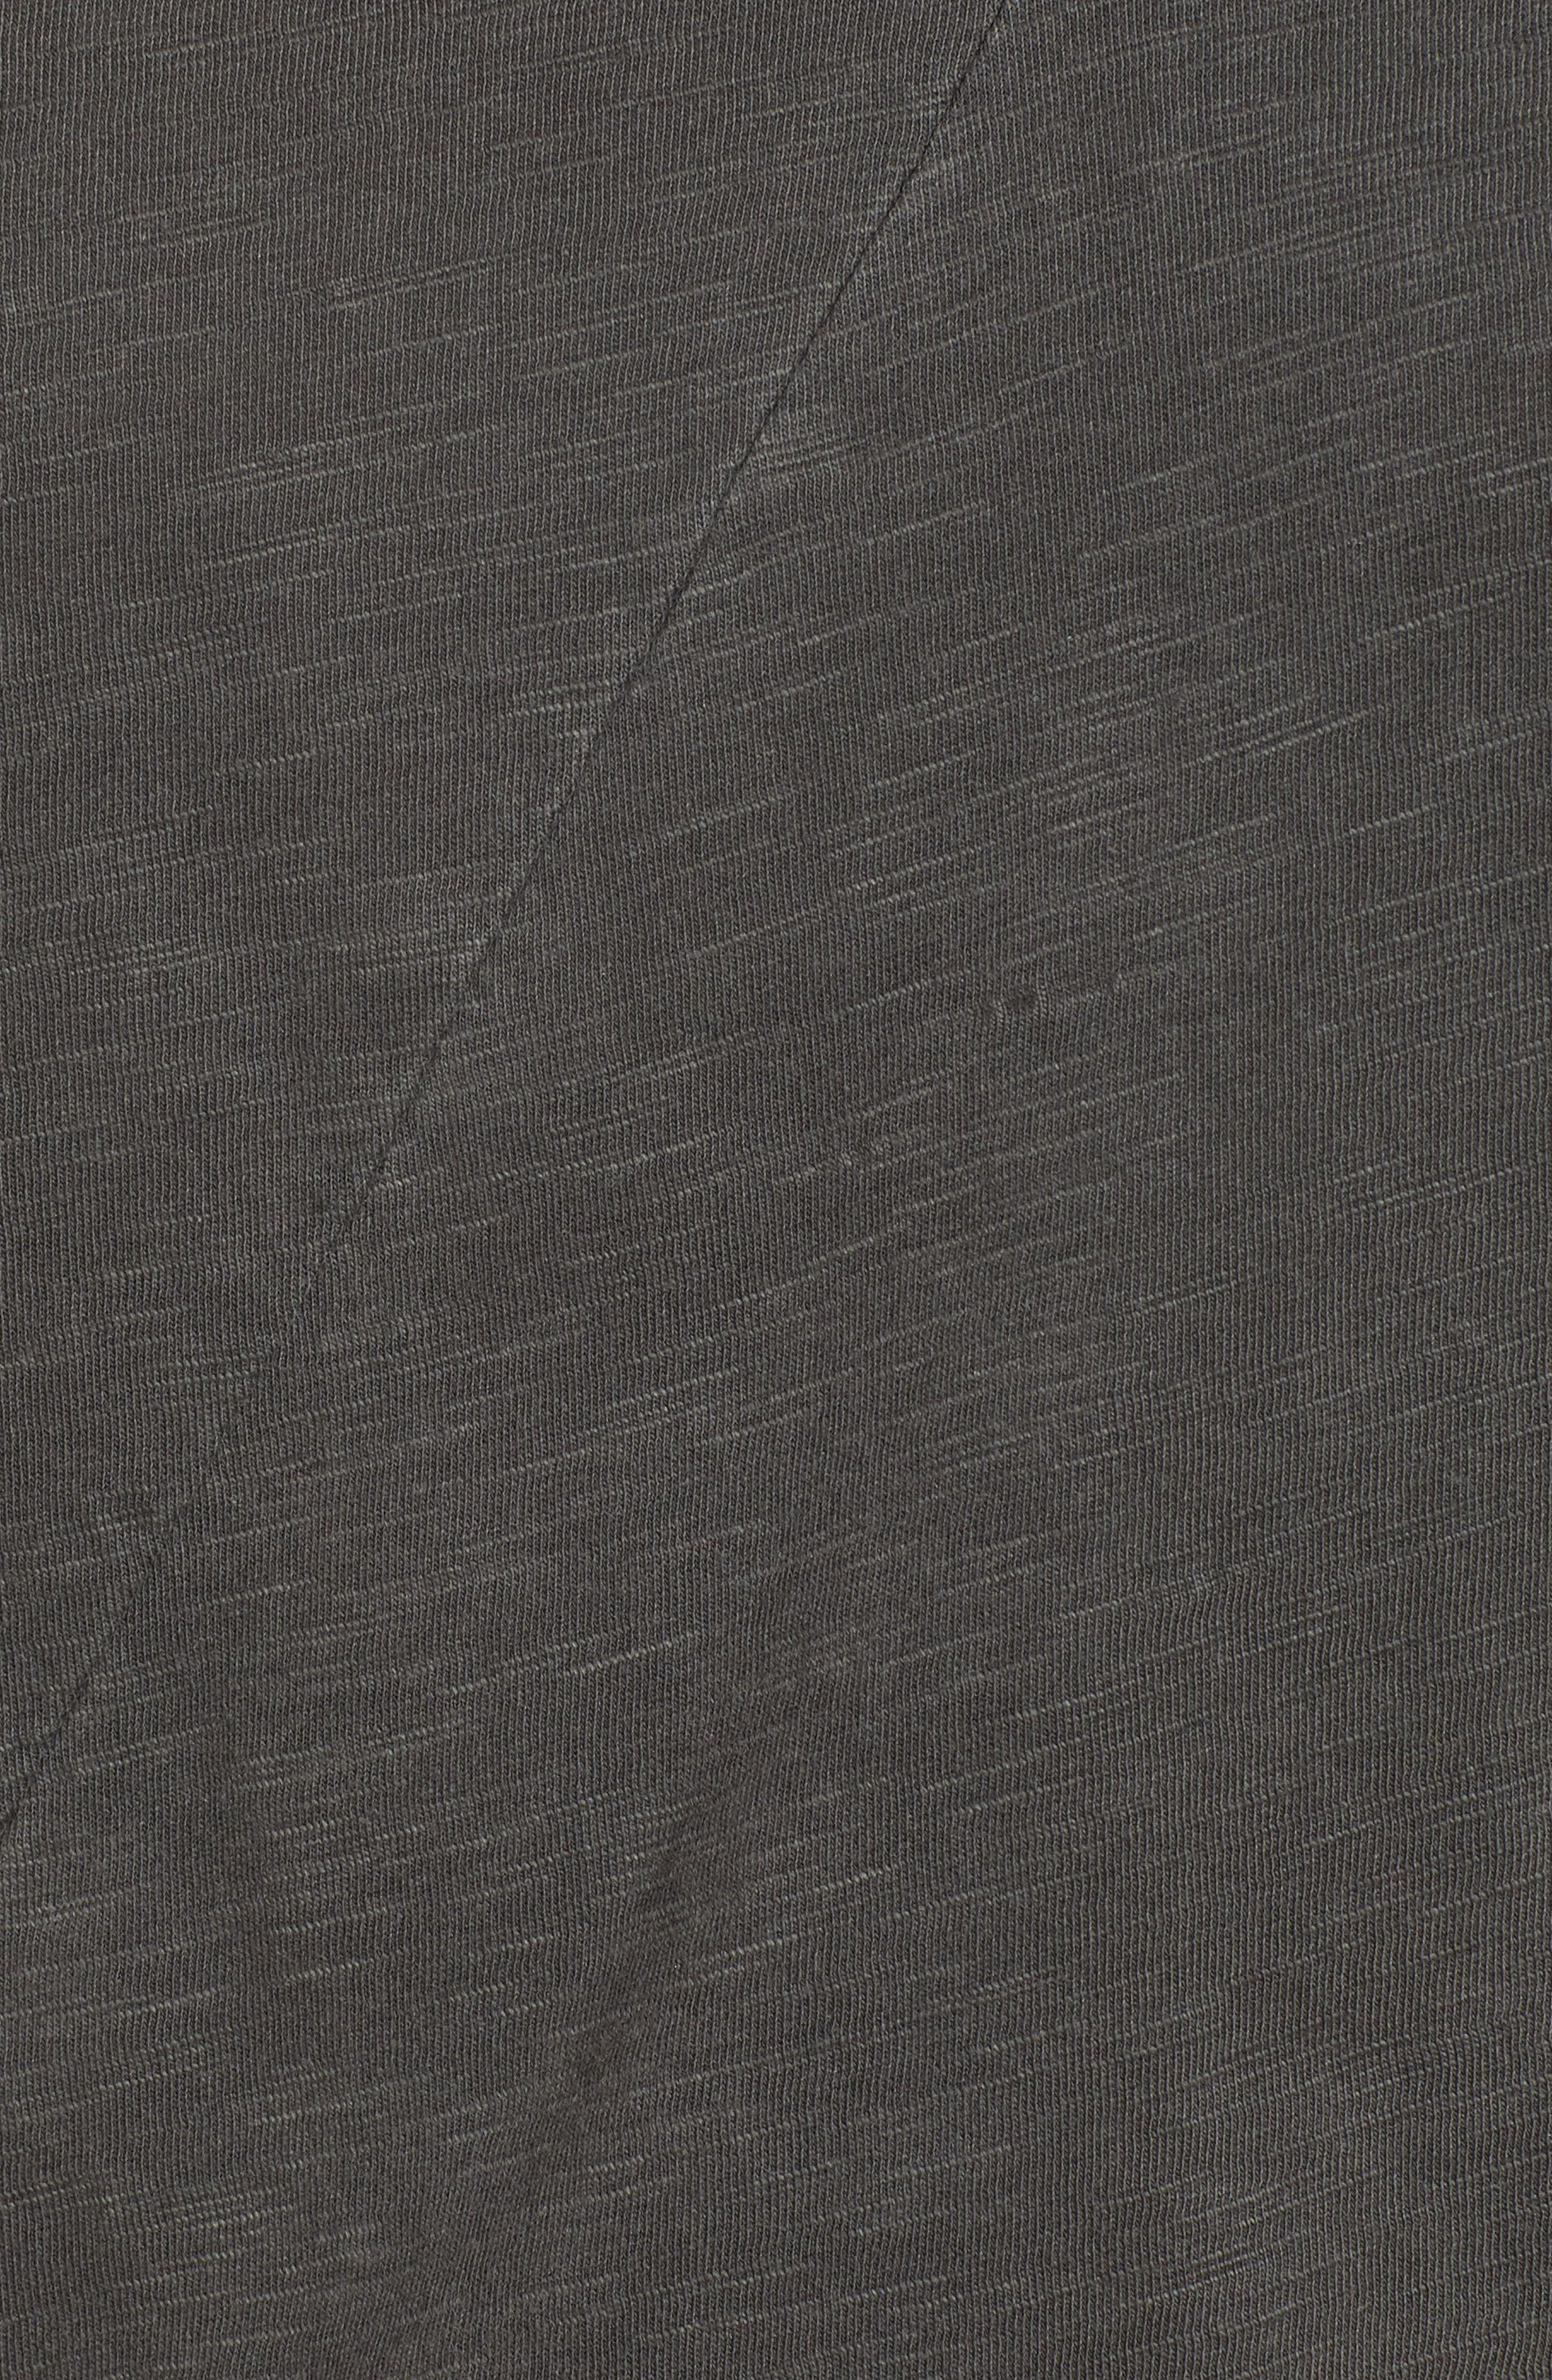 Lace-Up Shoulder Cotton Tee,                             Alternate thumbnail 6, color,                             Black Mountain